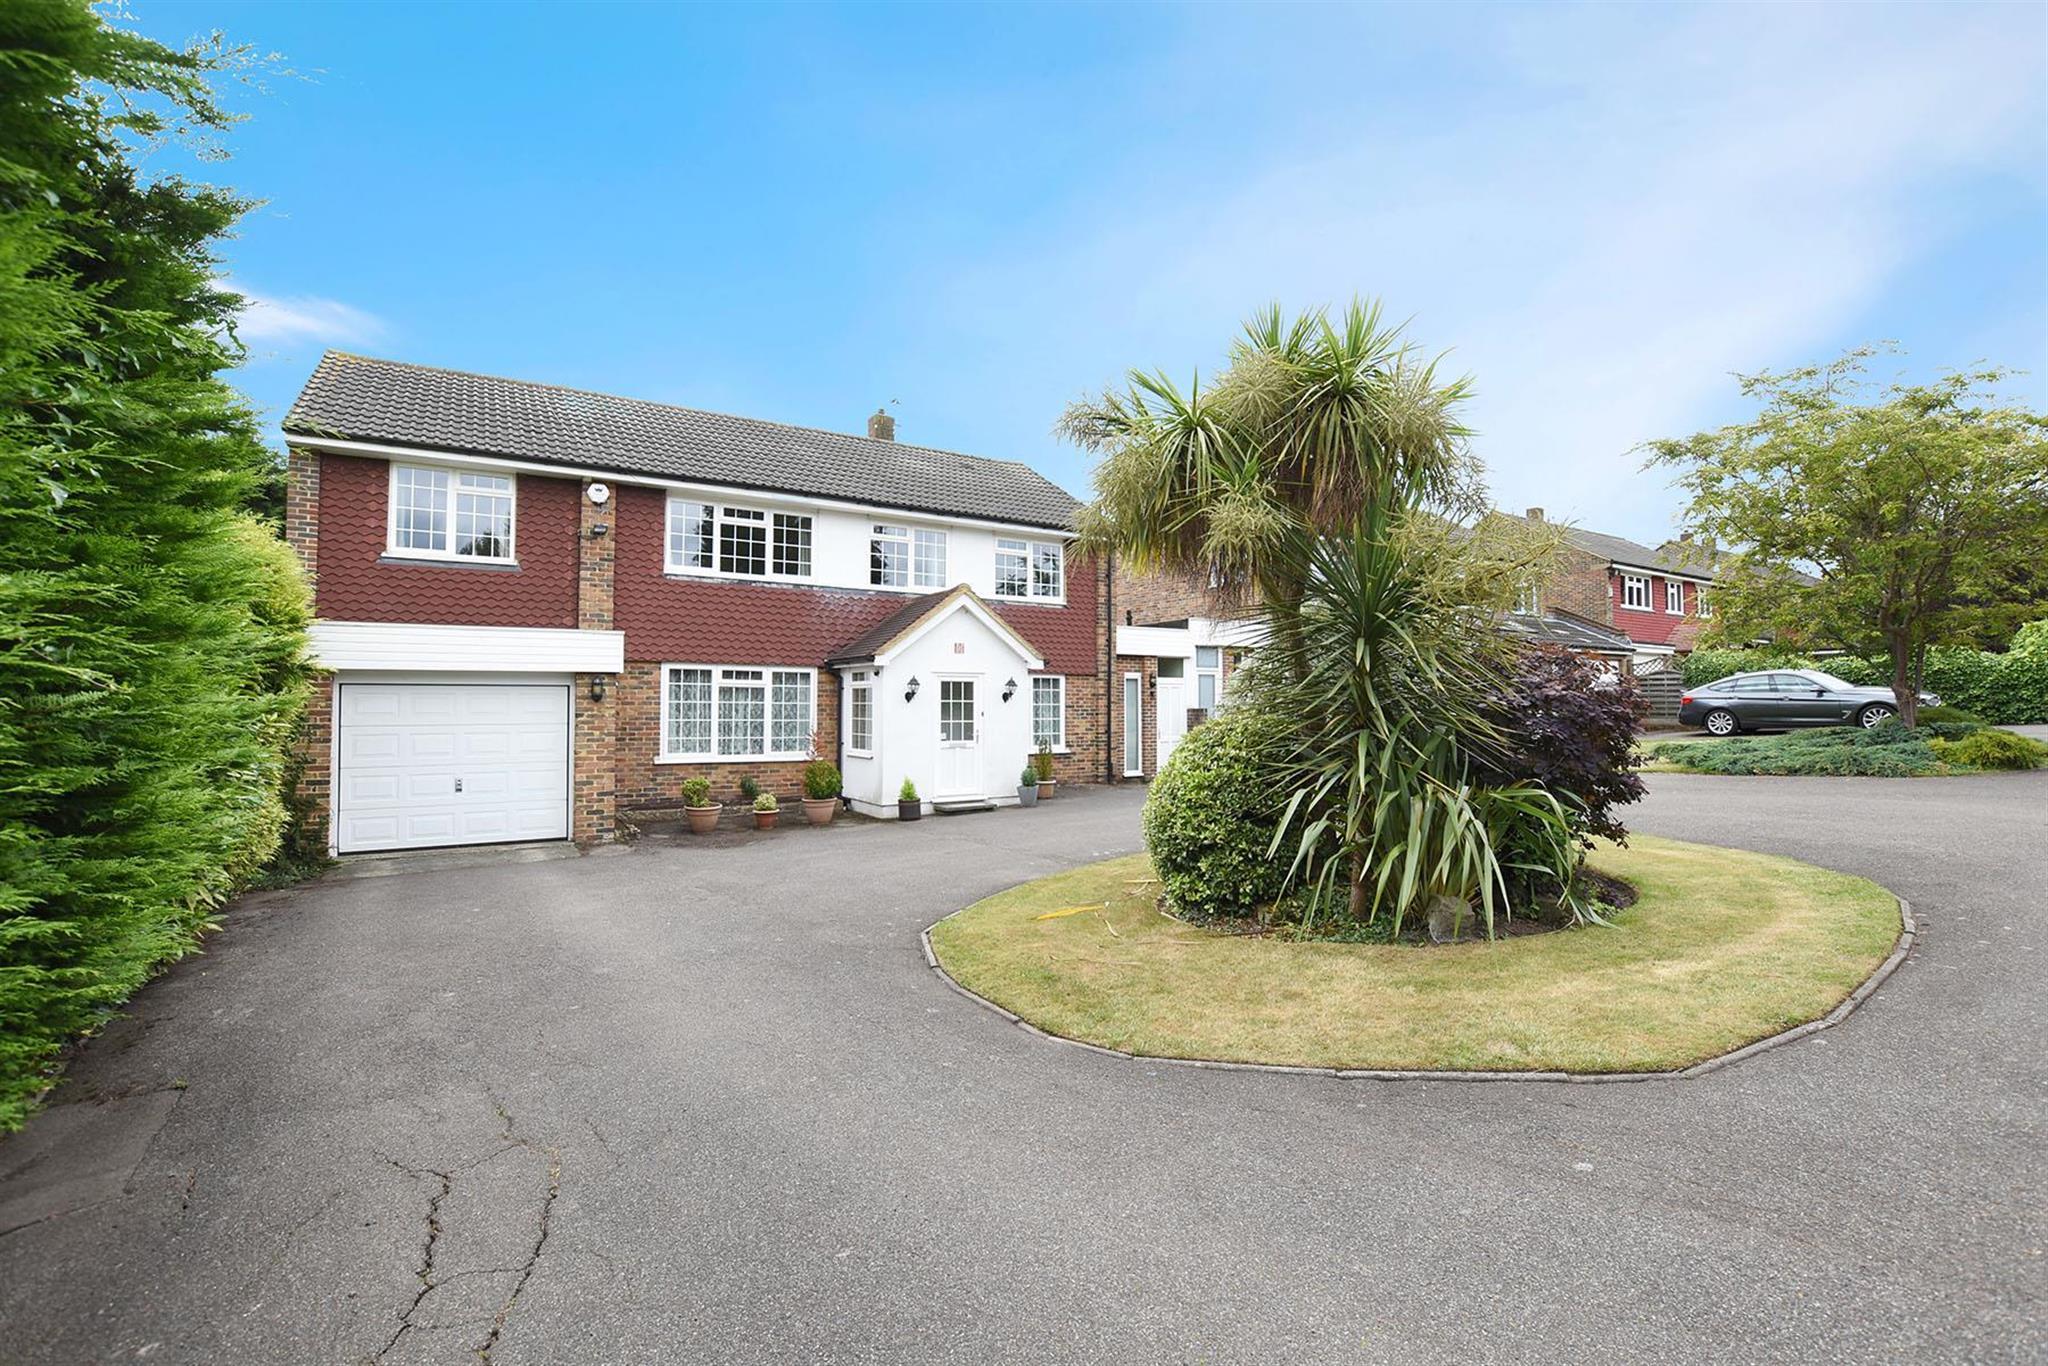 4 Or 5 Bedroom Rental House In Salisbury Nc 4 Bedroom House To Rent Salisbury Close Worcester Park